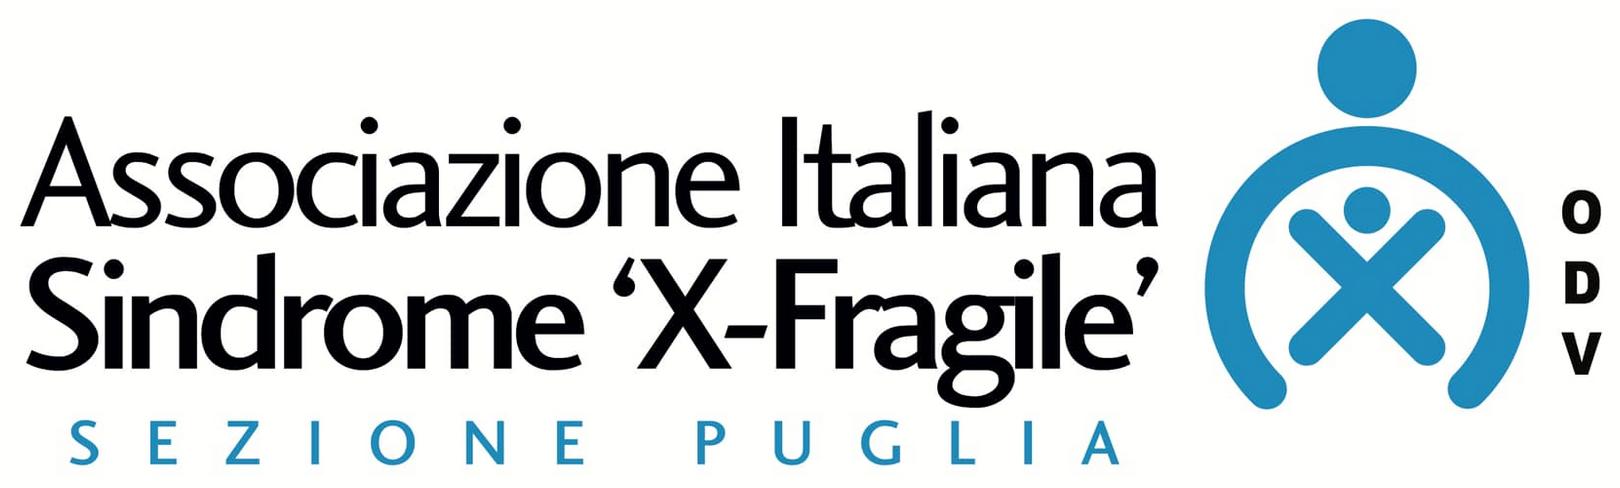 Associazione Italiana X-Fragile